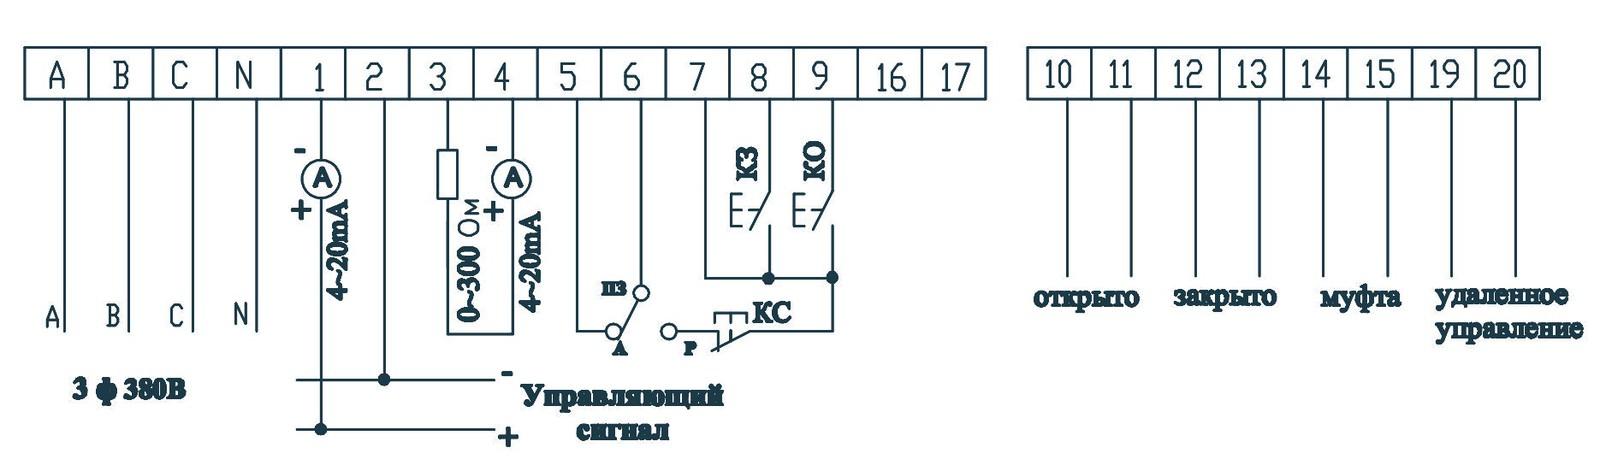 ГРПШ-03М-1У1-1, ГРПШ-03М-1У1-2, ГРПШ-03М-1У1-3